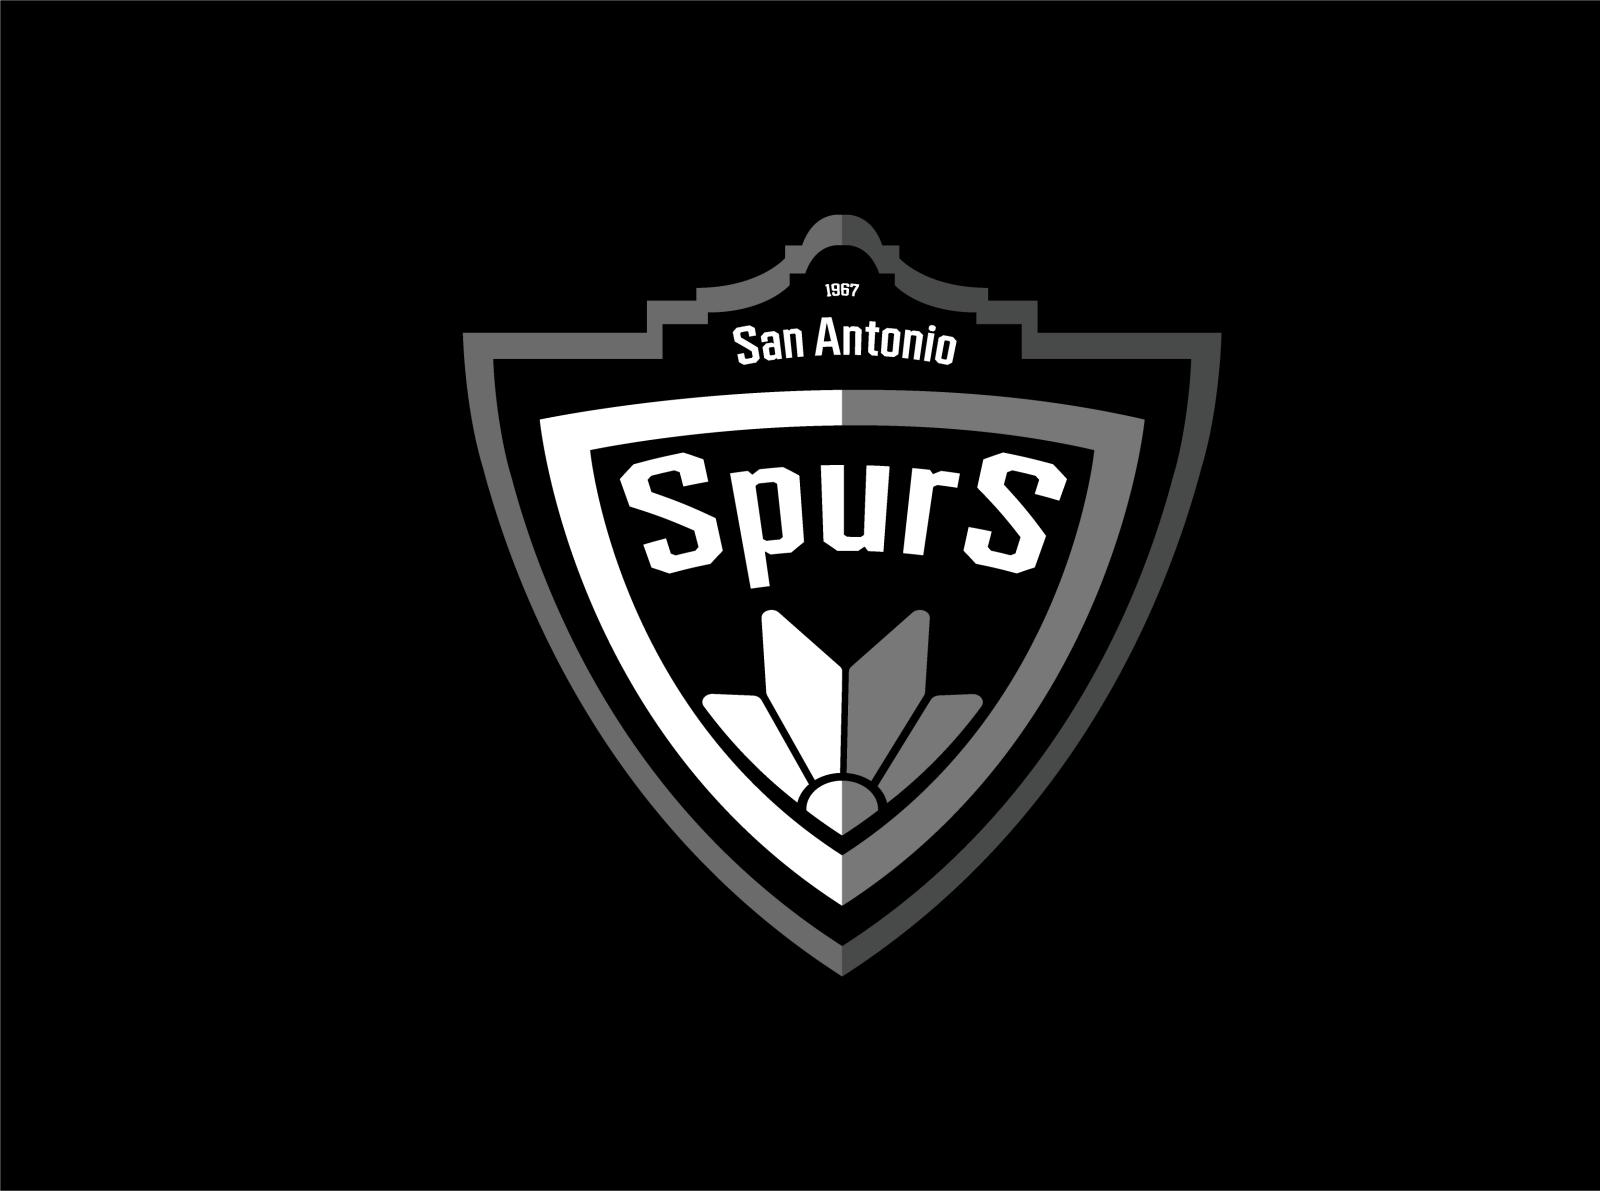 Pin By Philip Mcmains On Nba Team Logos San Antonio Spurs Basketball San Antonio Spurs Logo Spurs Logo